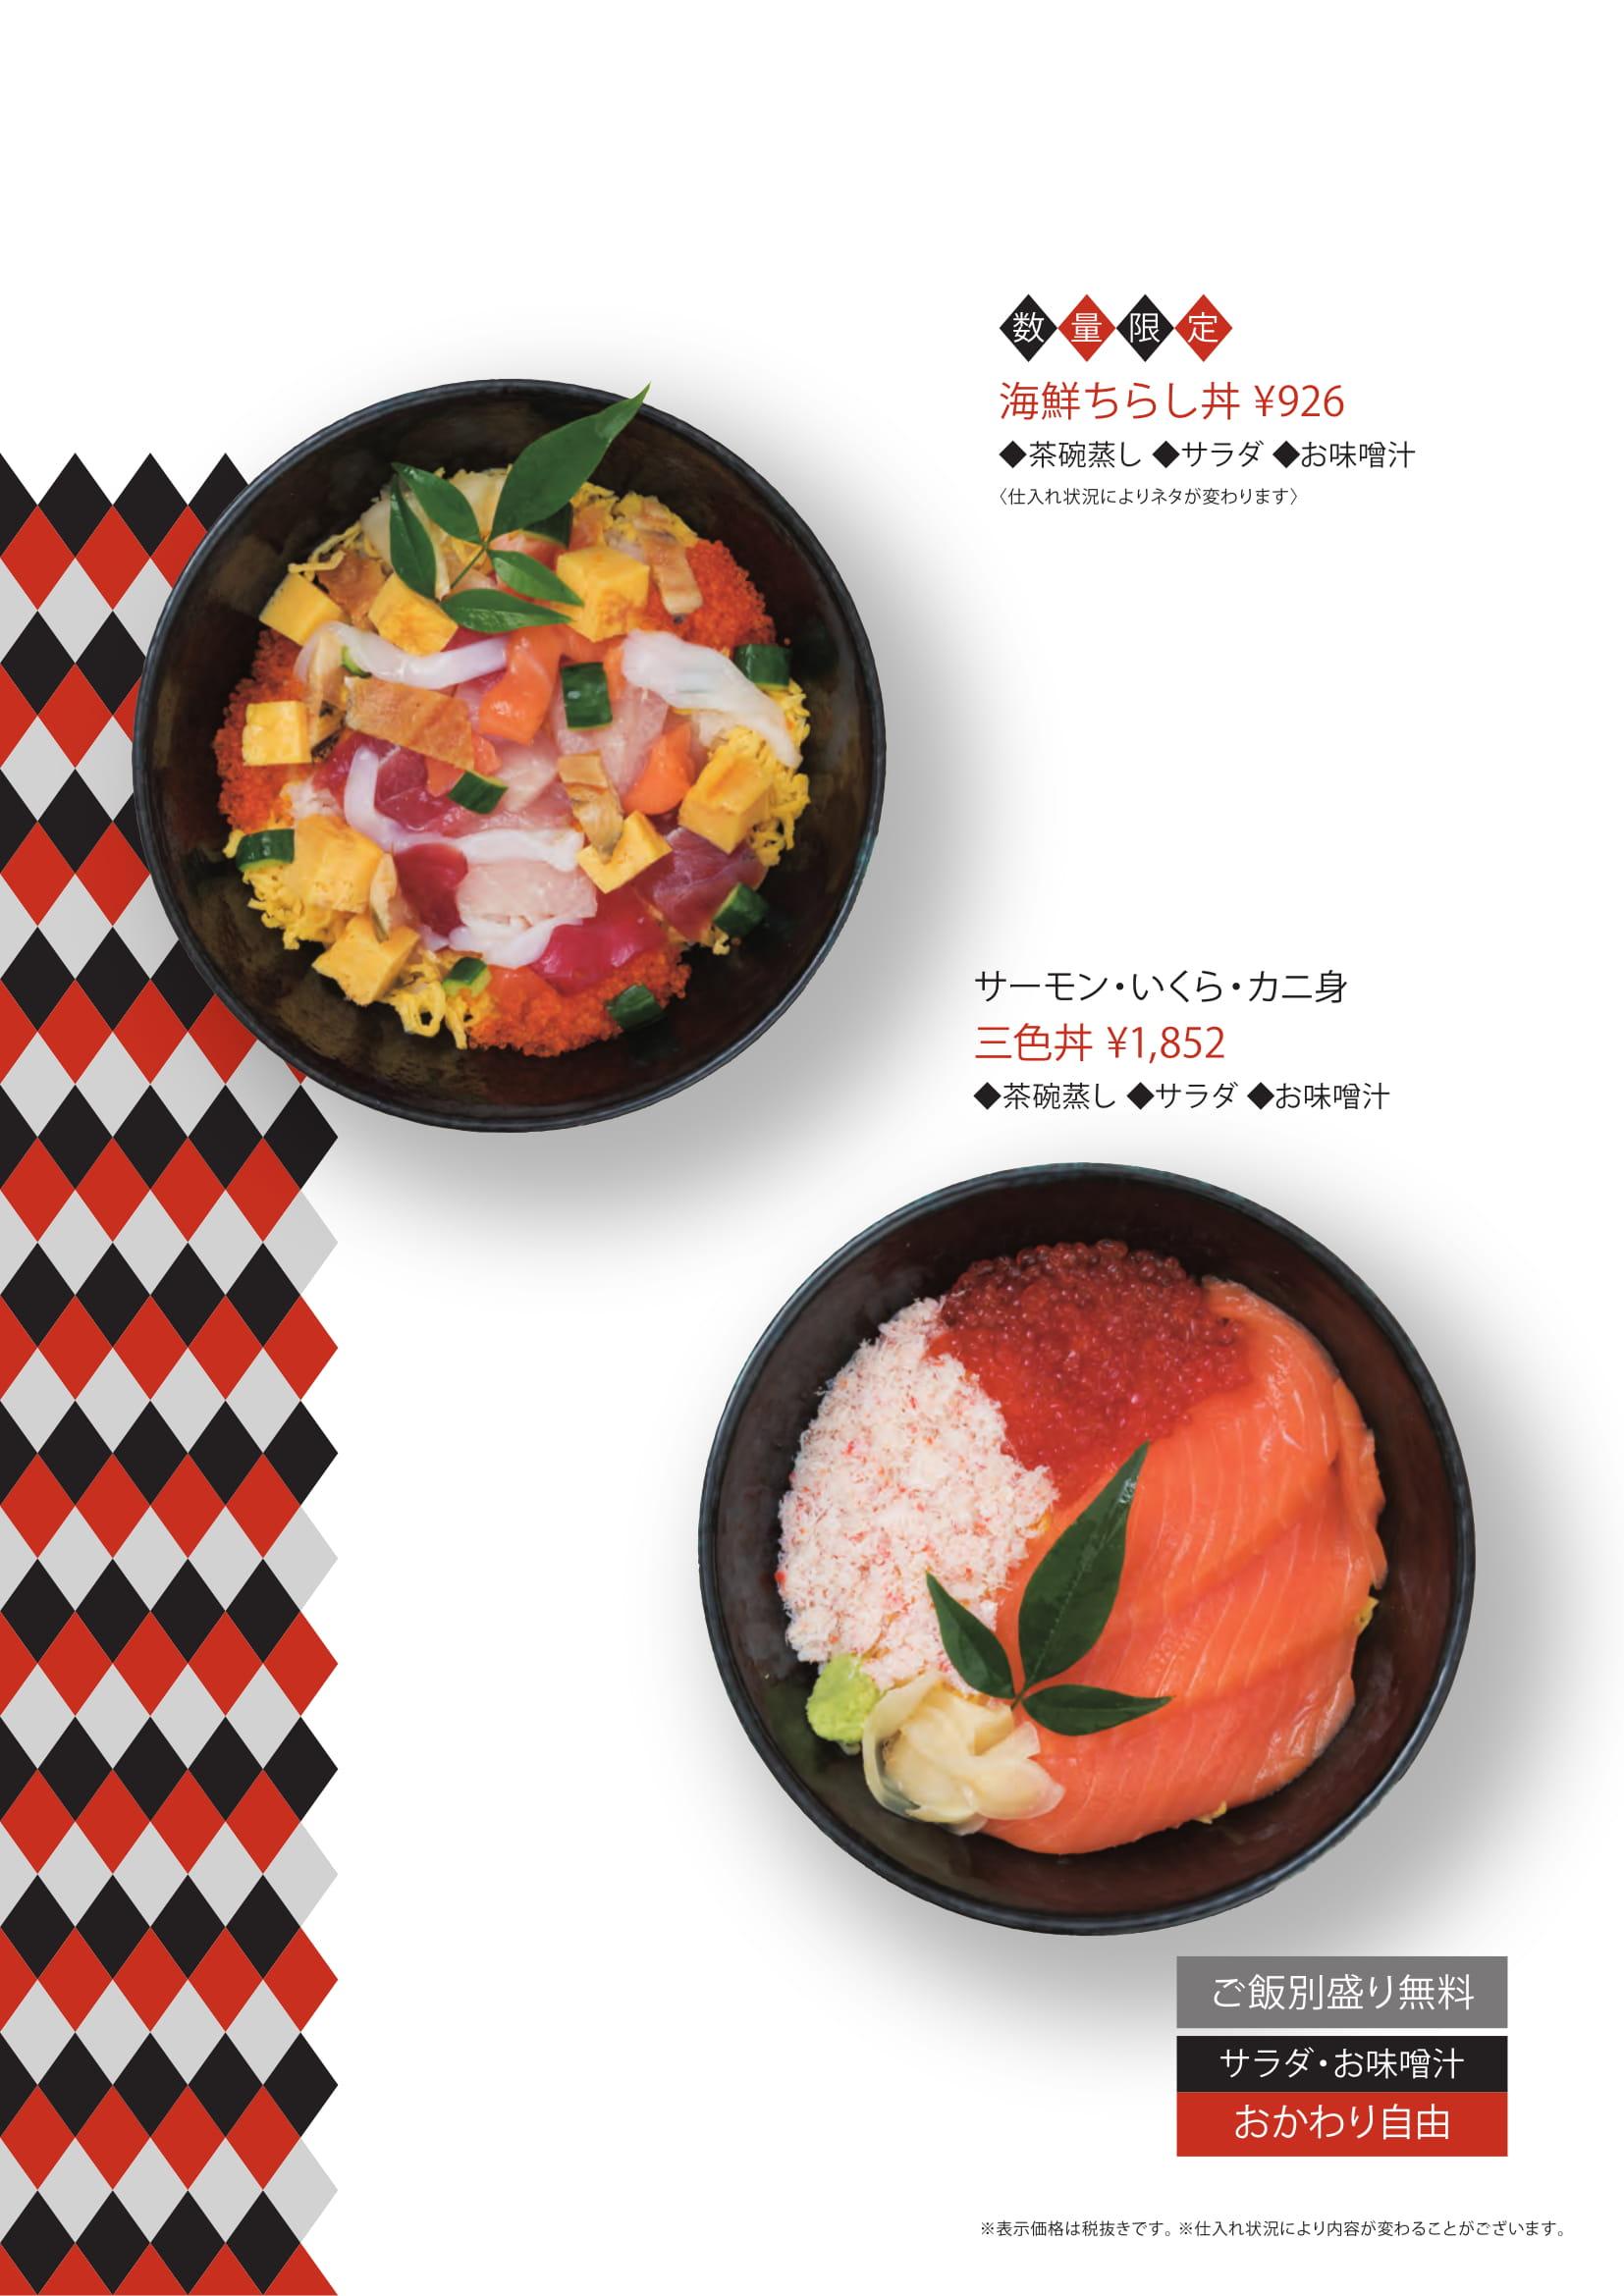 Japanese lunch edited-2.jpg